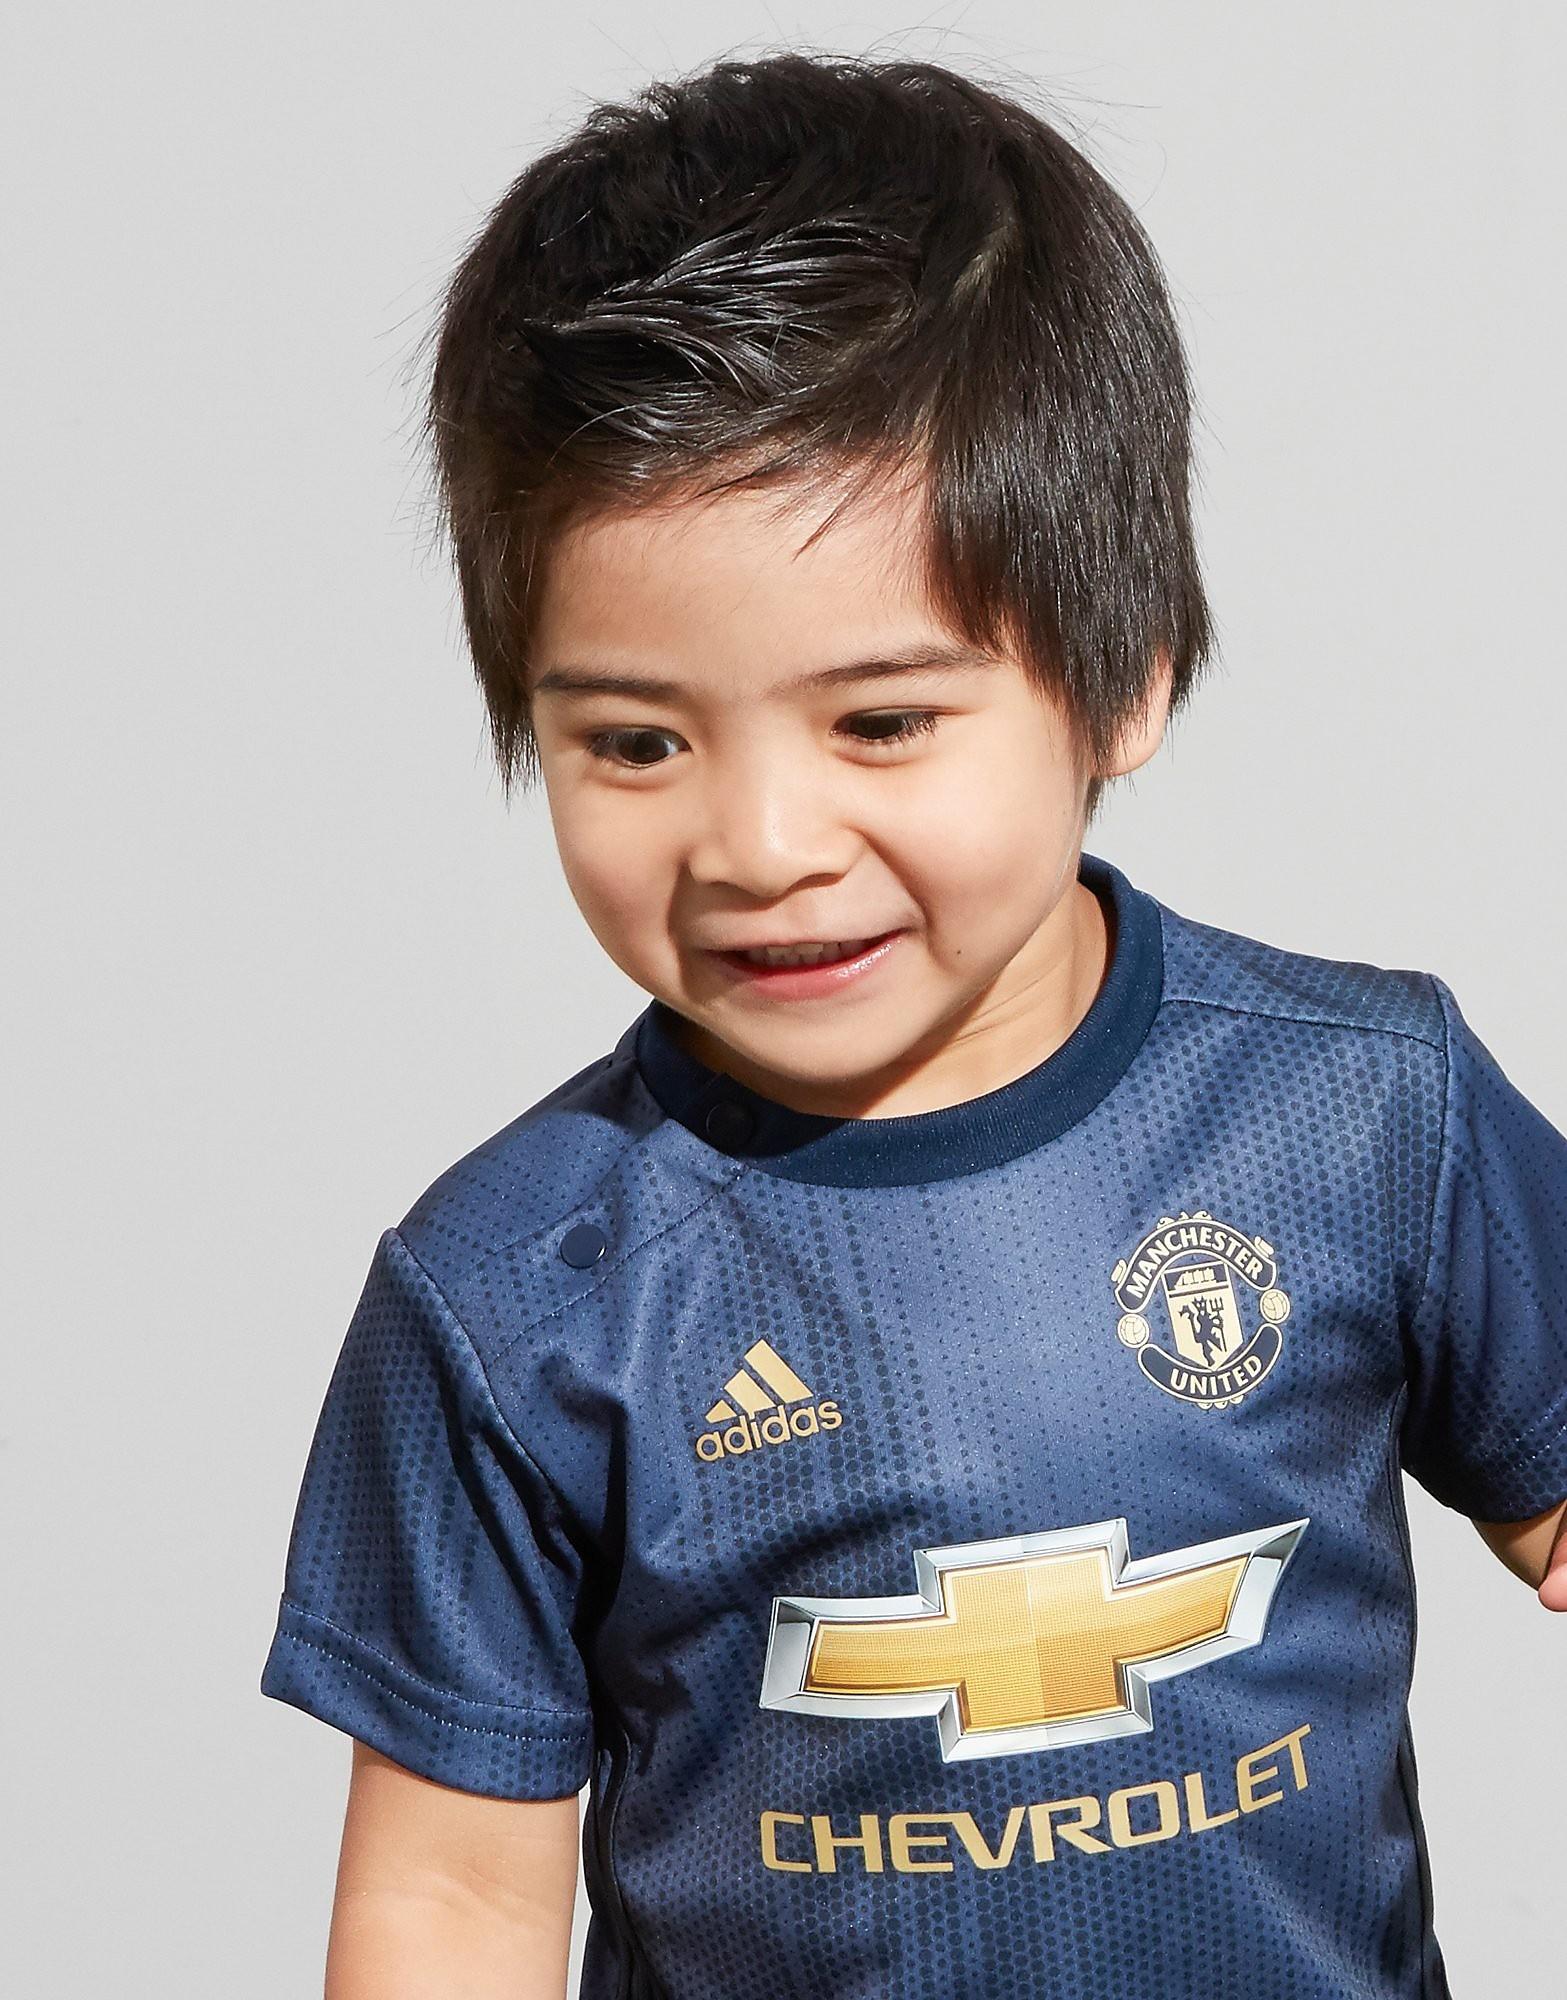 adidas Manchester United FC 2018/19 Completo Third Bebè